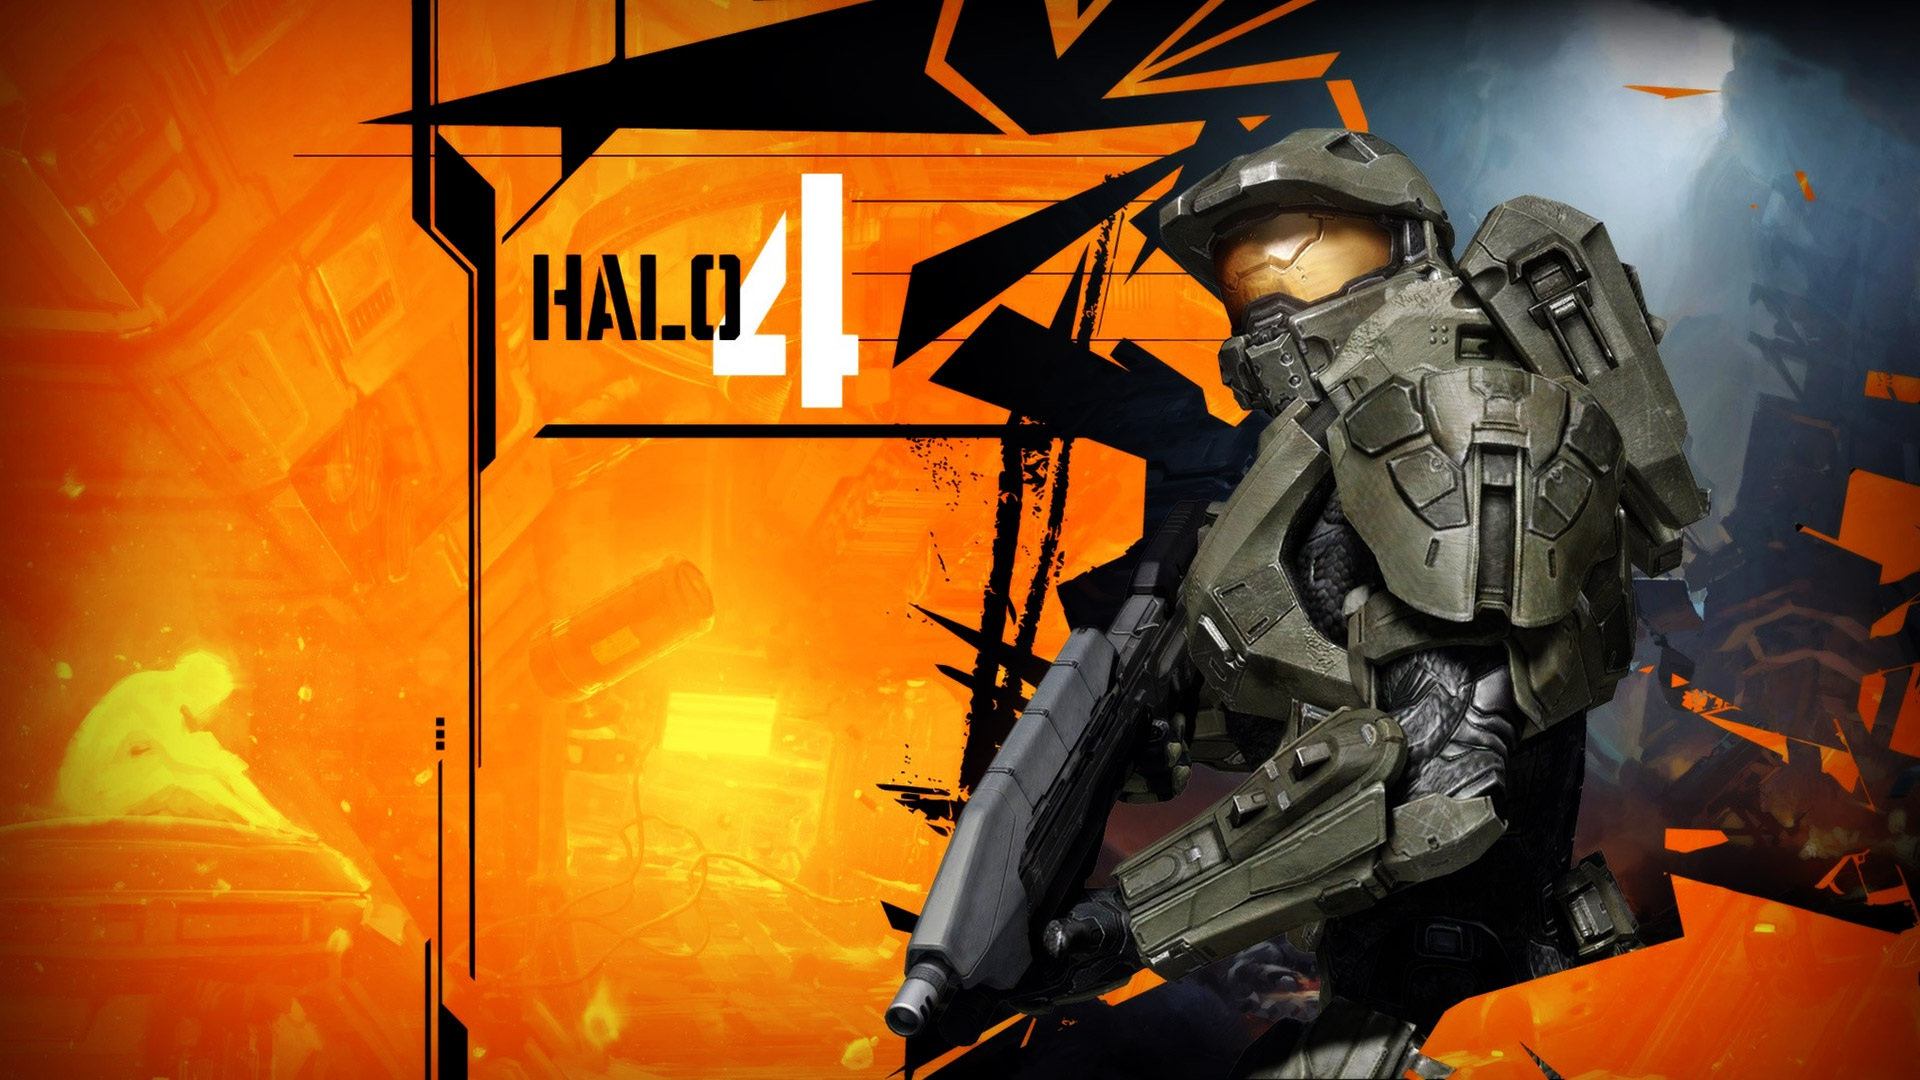 Halo 4 wallpaper 48